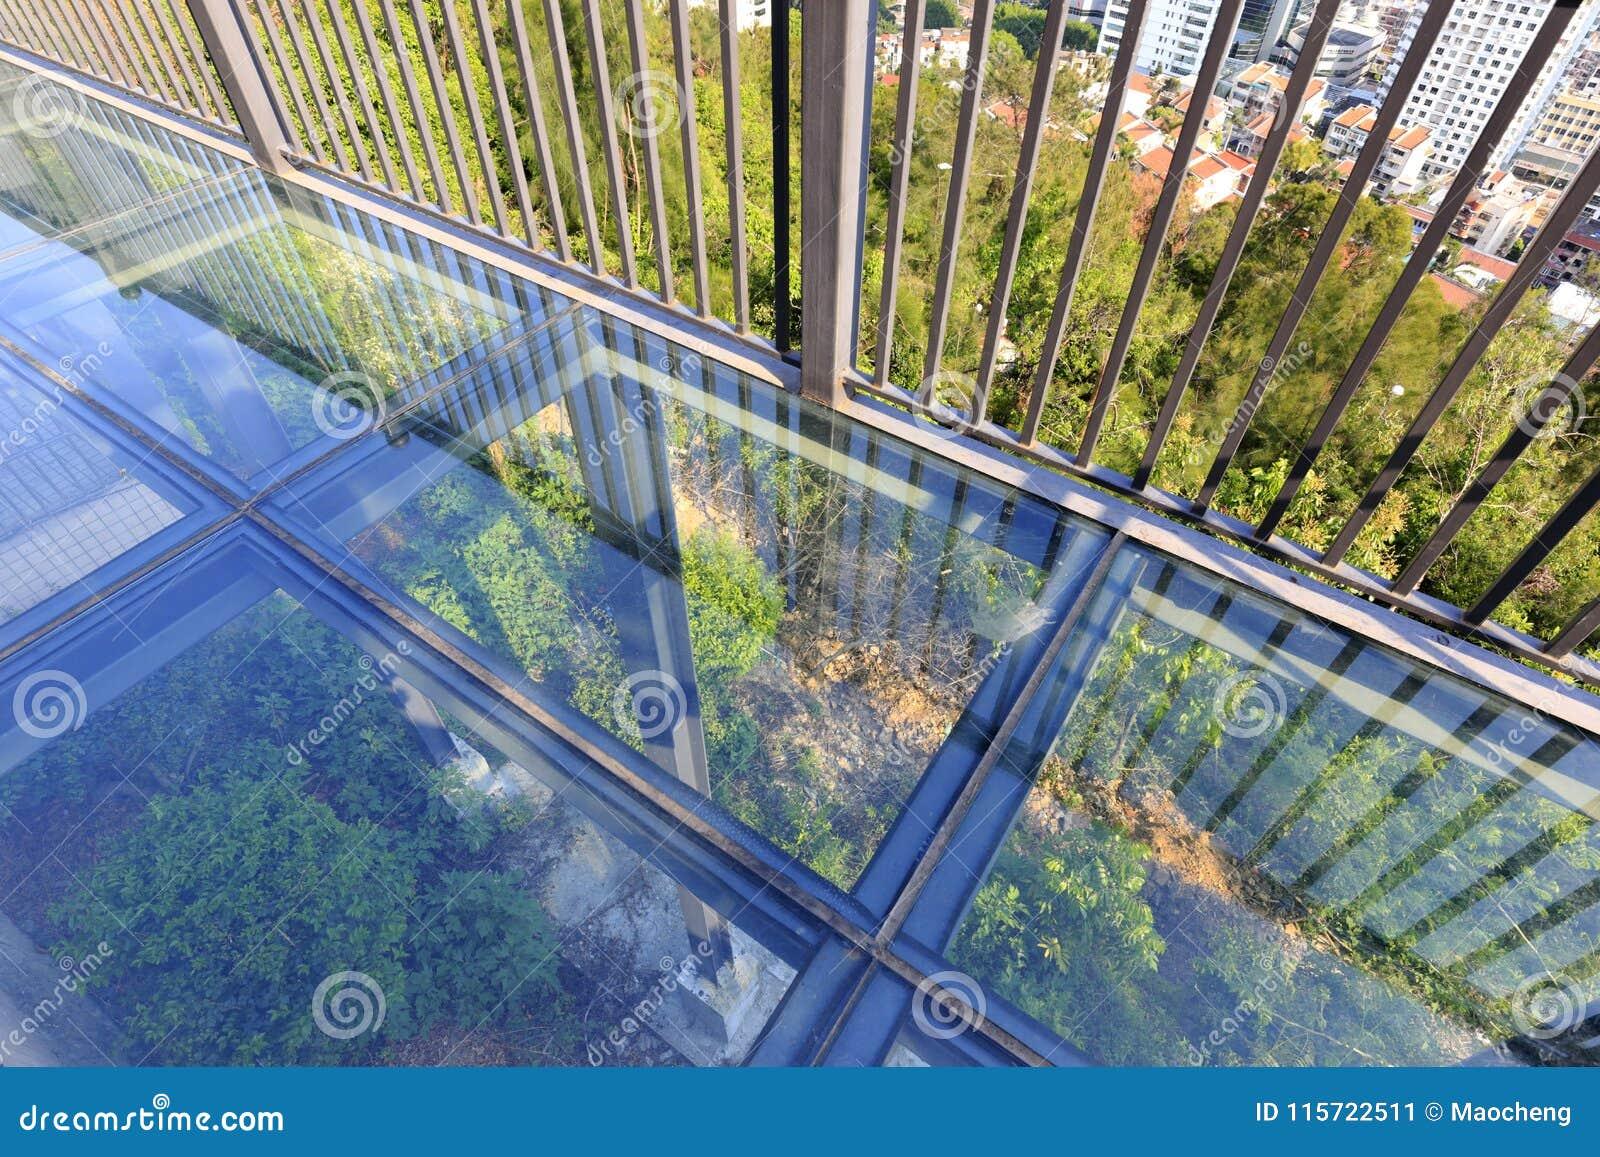 Balcony transparent glass floor, adobe rgb